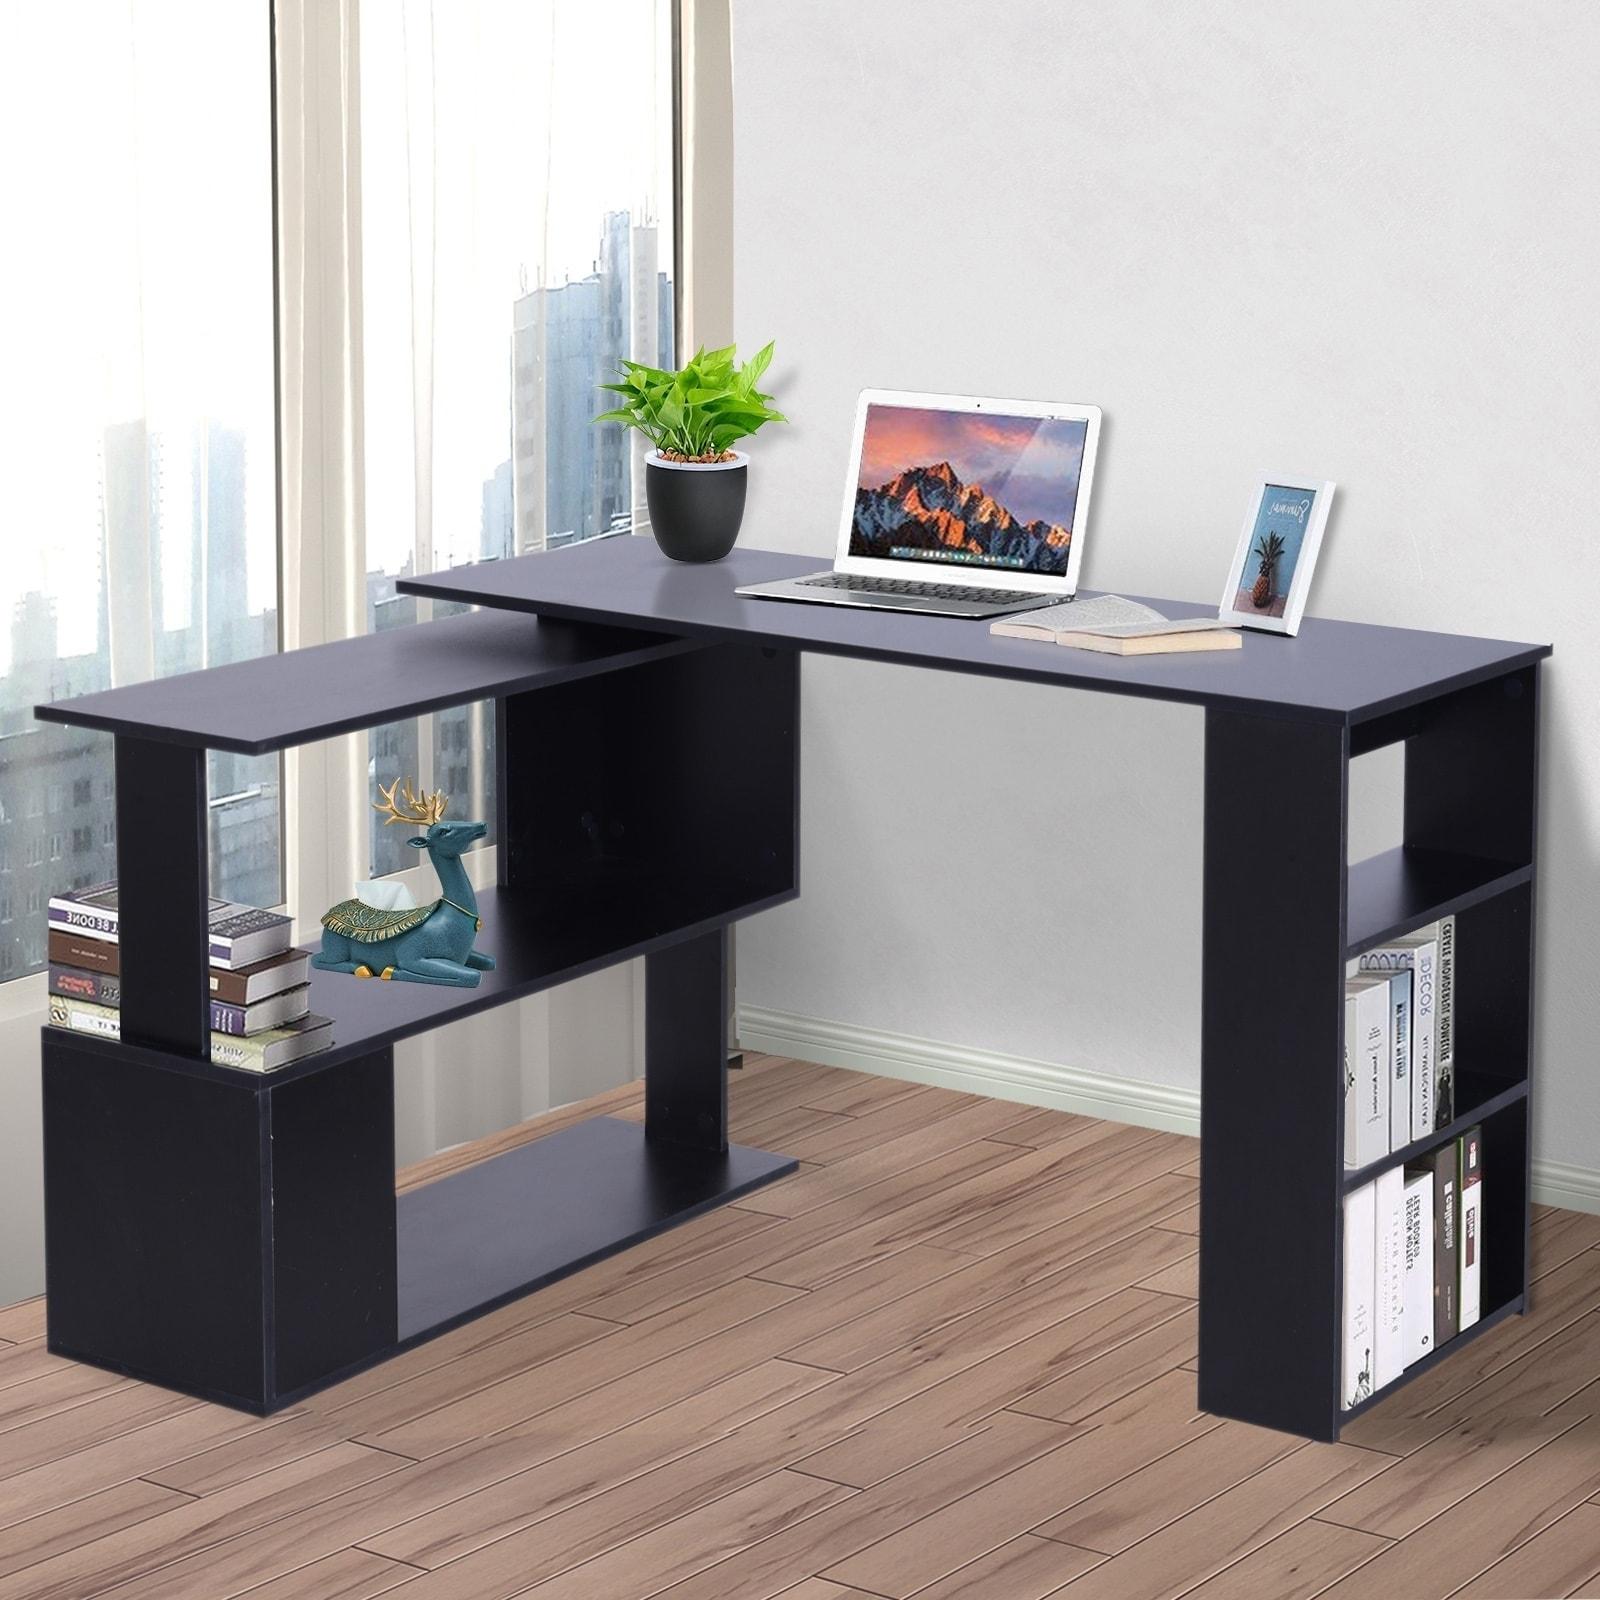 Porch Den Arbordale Black Finish L Shaped Rotating Computer Desk With Bookshelves Overstock 28265907